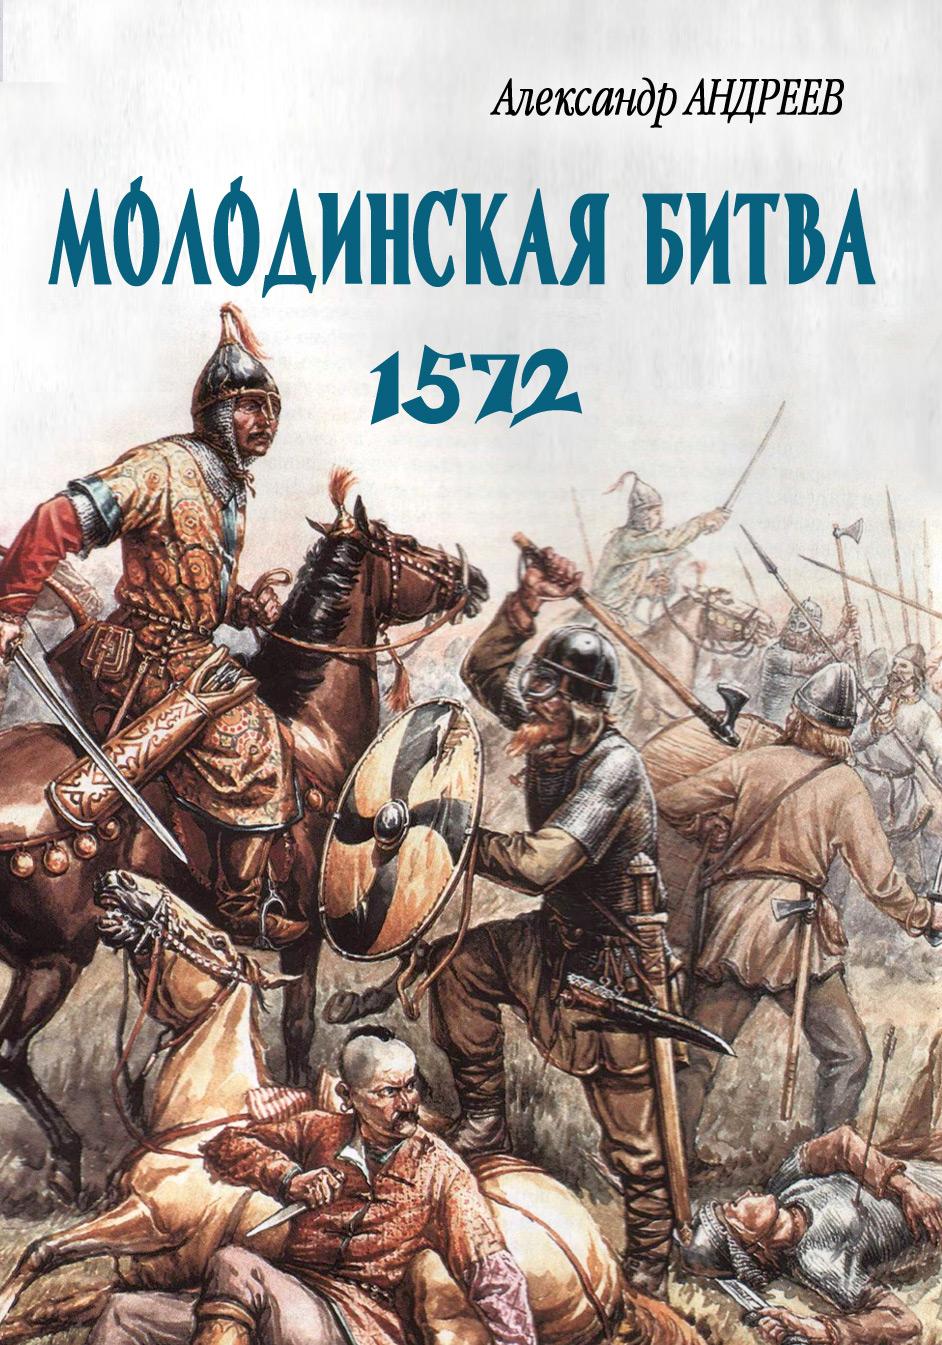 Александр Андреев Неизвестное Бородино. Молодинская битва 1572 года цена